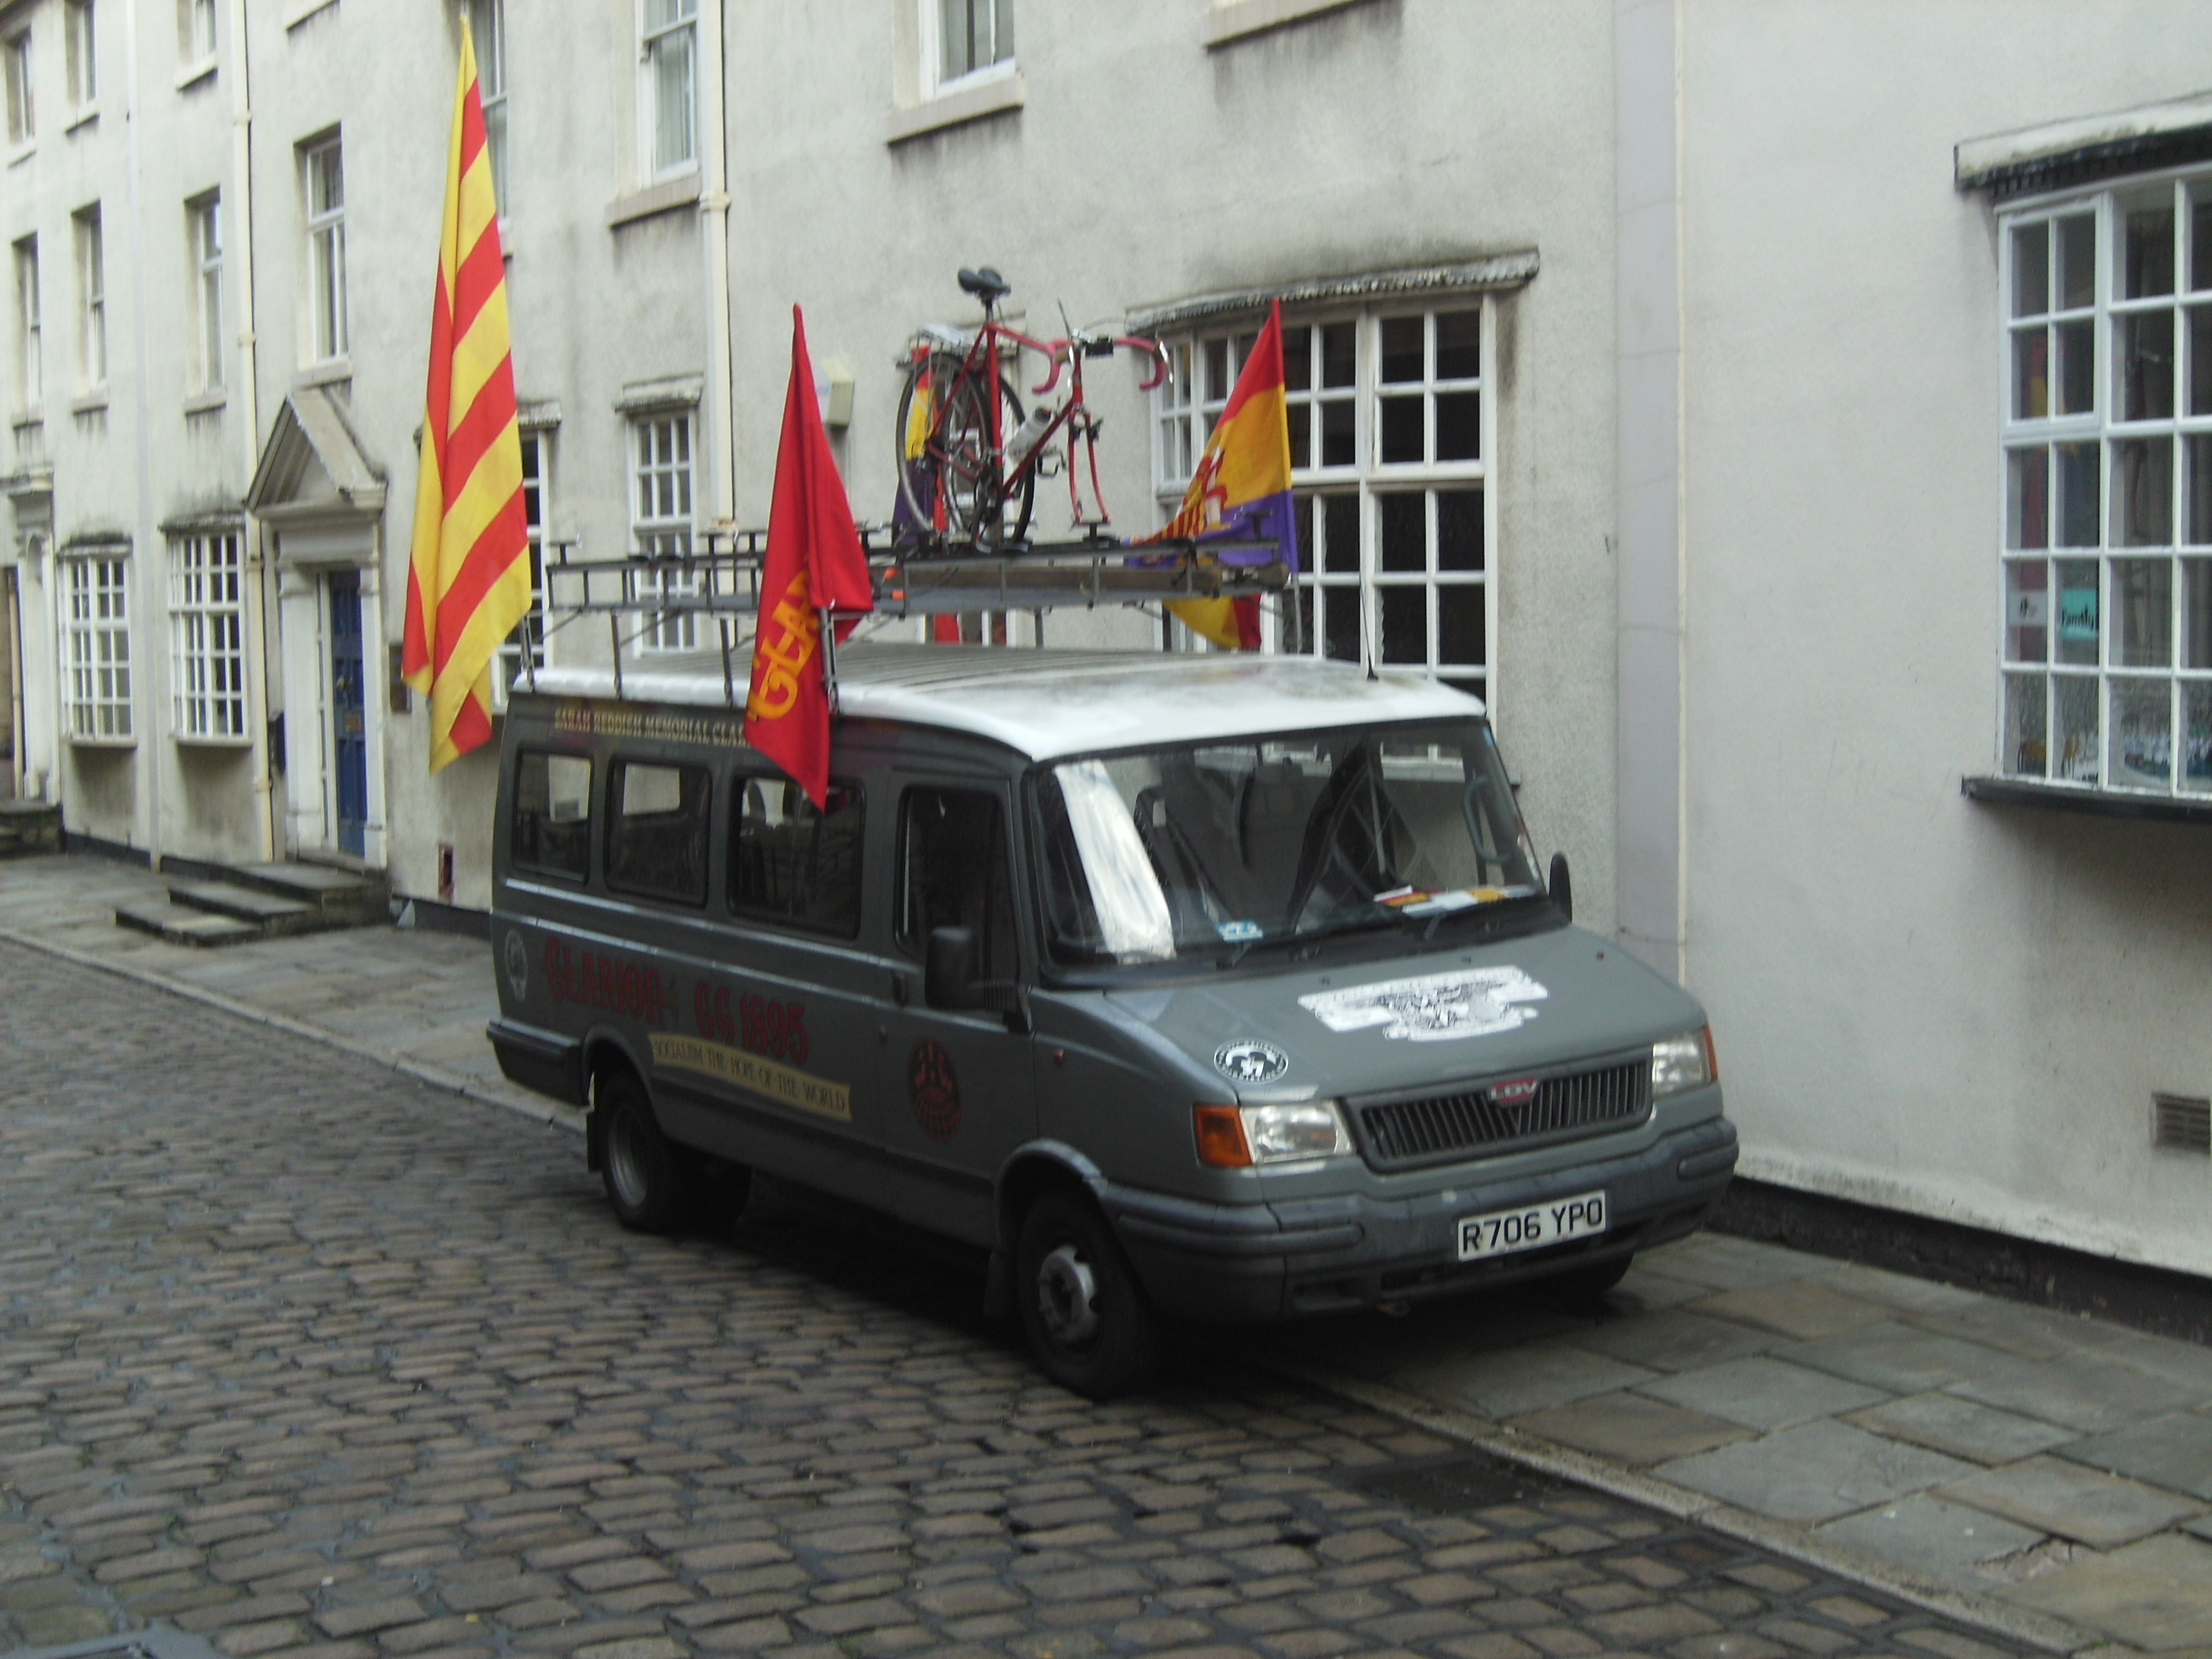 The bus by Bolton Socialist Club